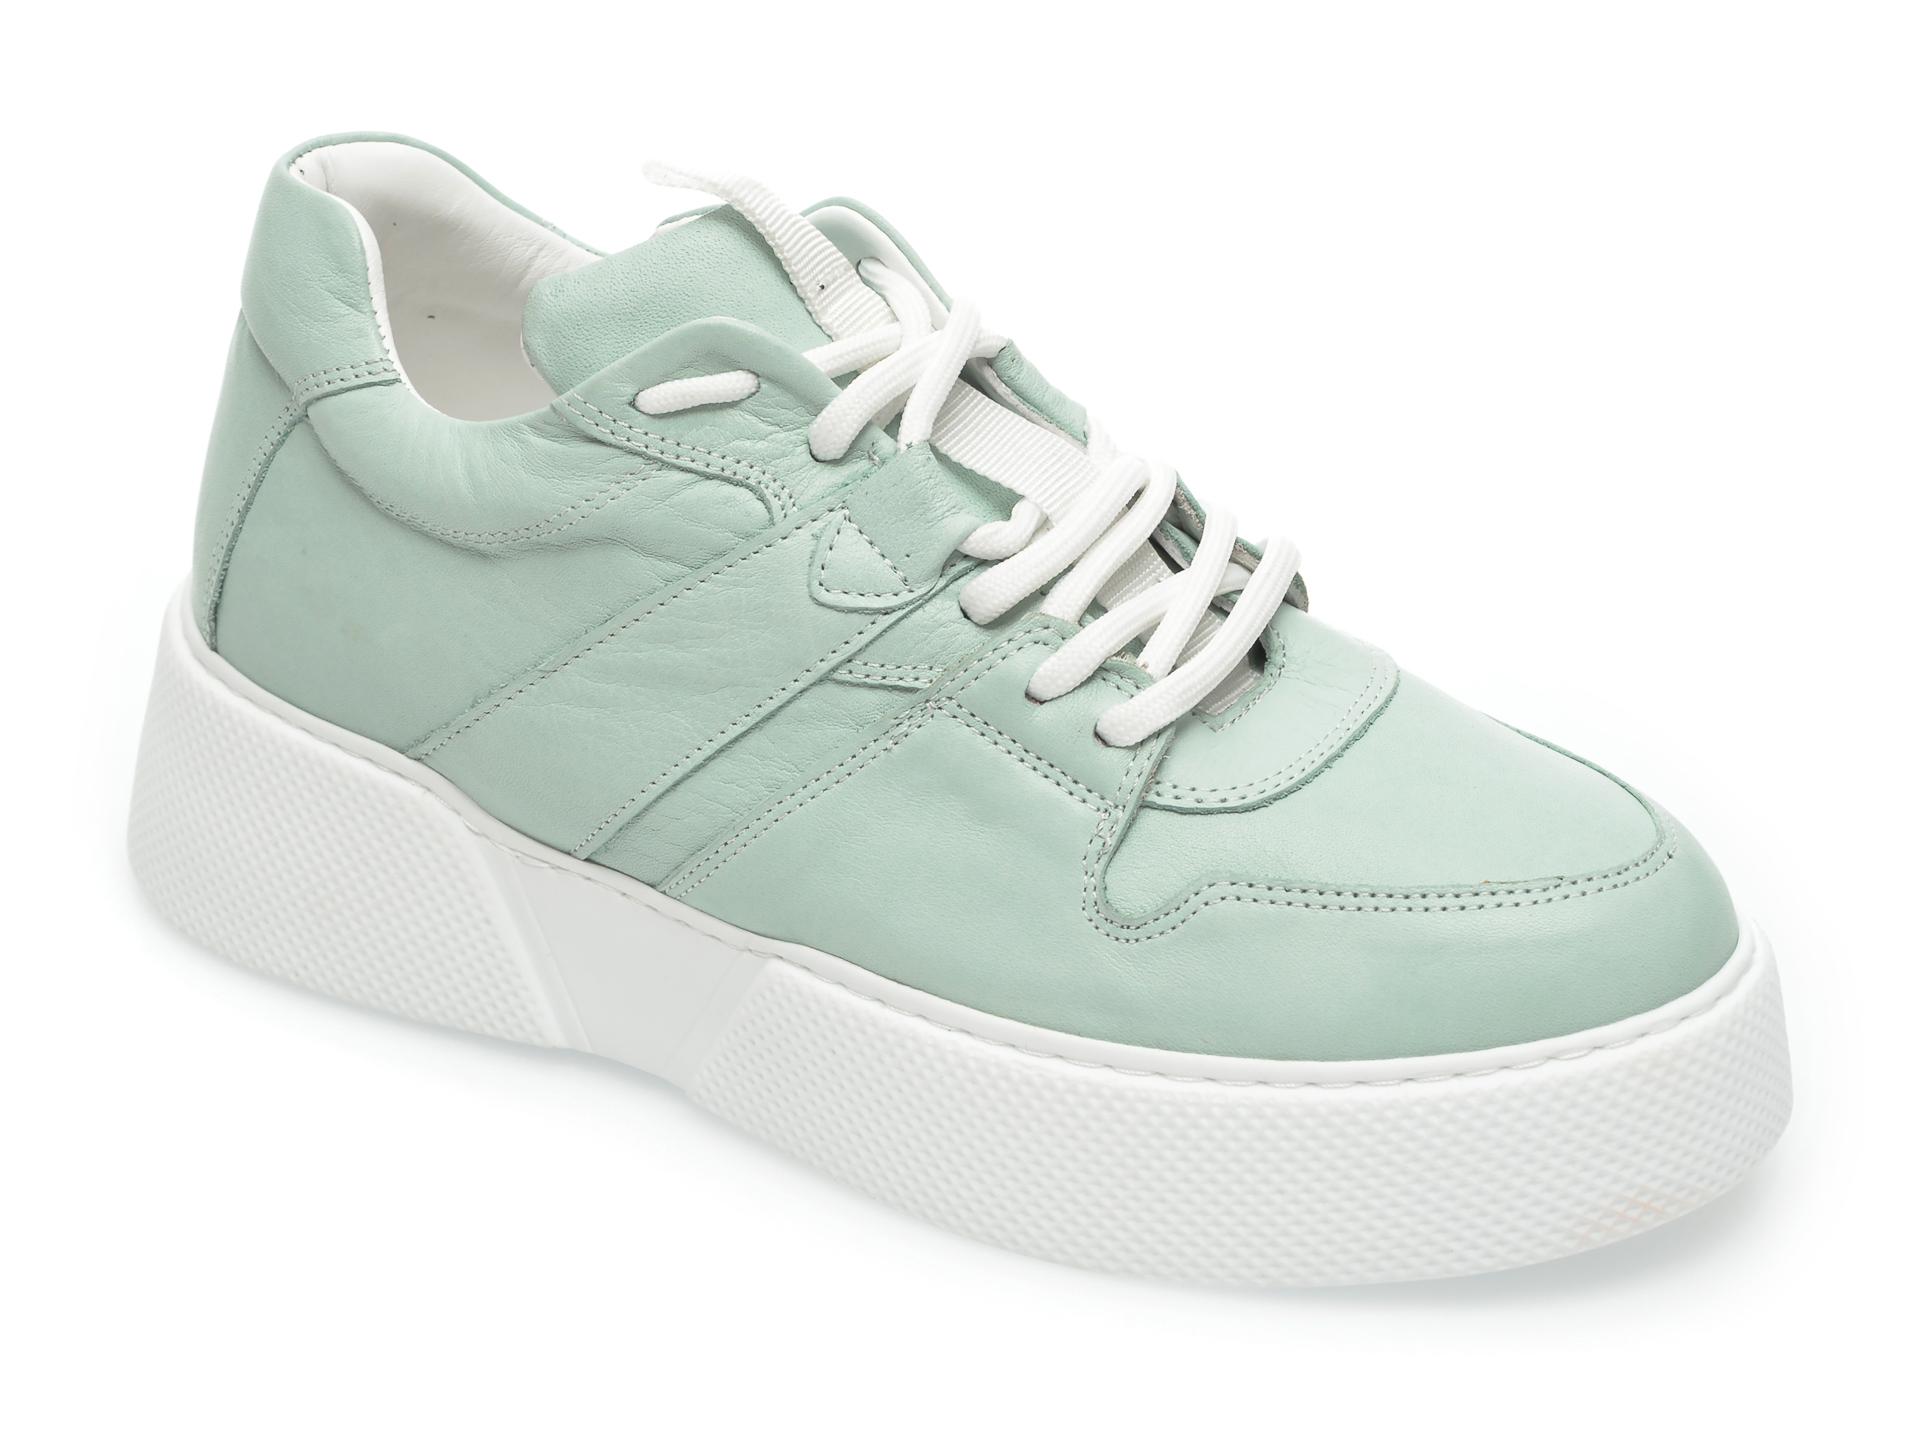 Pantofi Flavia Passini Verzi, 4701, Din Piele Naturala